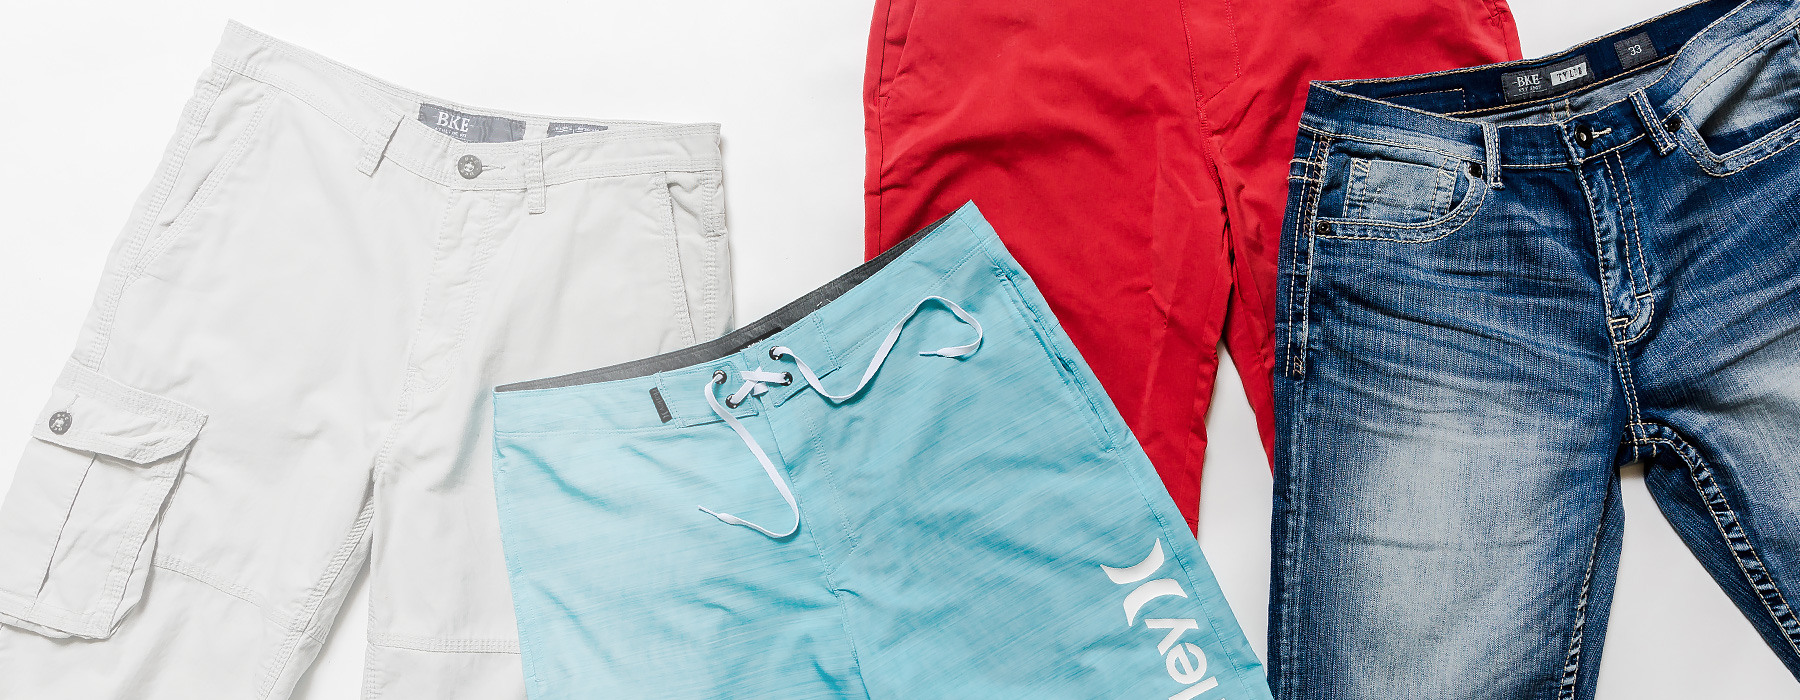 A pair of BKE khaki shorts, a pair of Hurley boardshorts, and a pair of BKE denim shorts